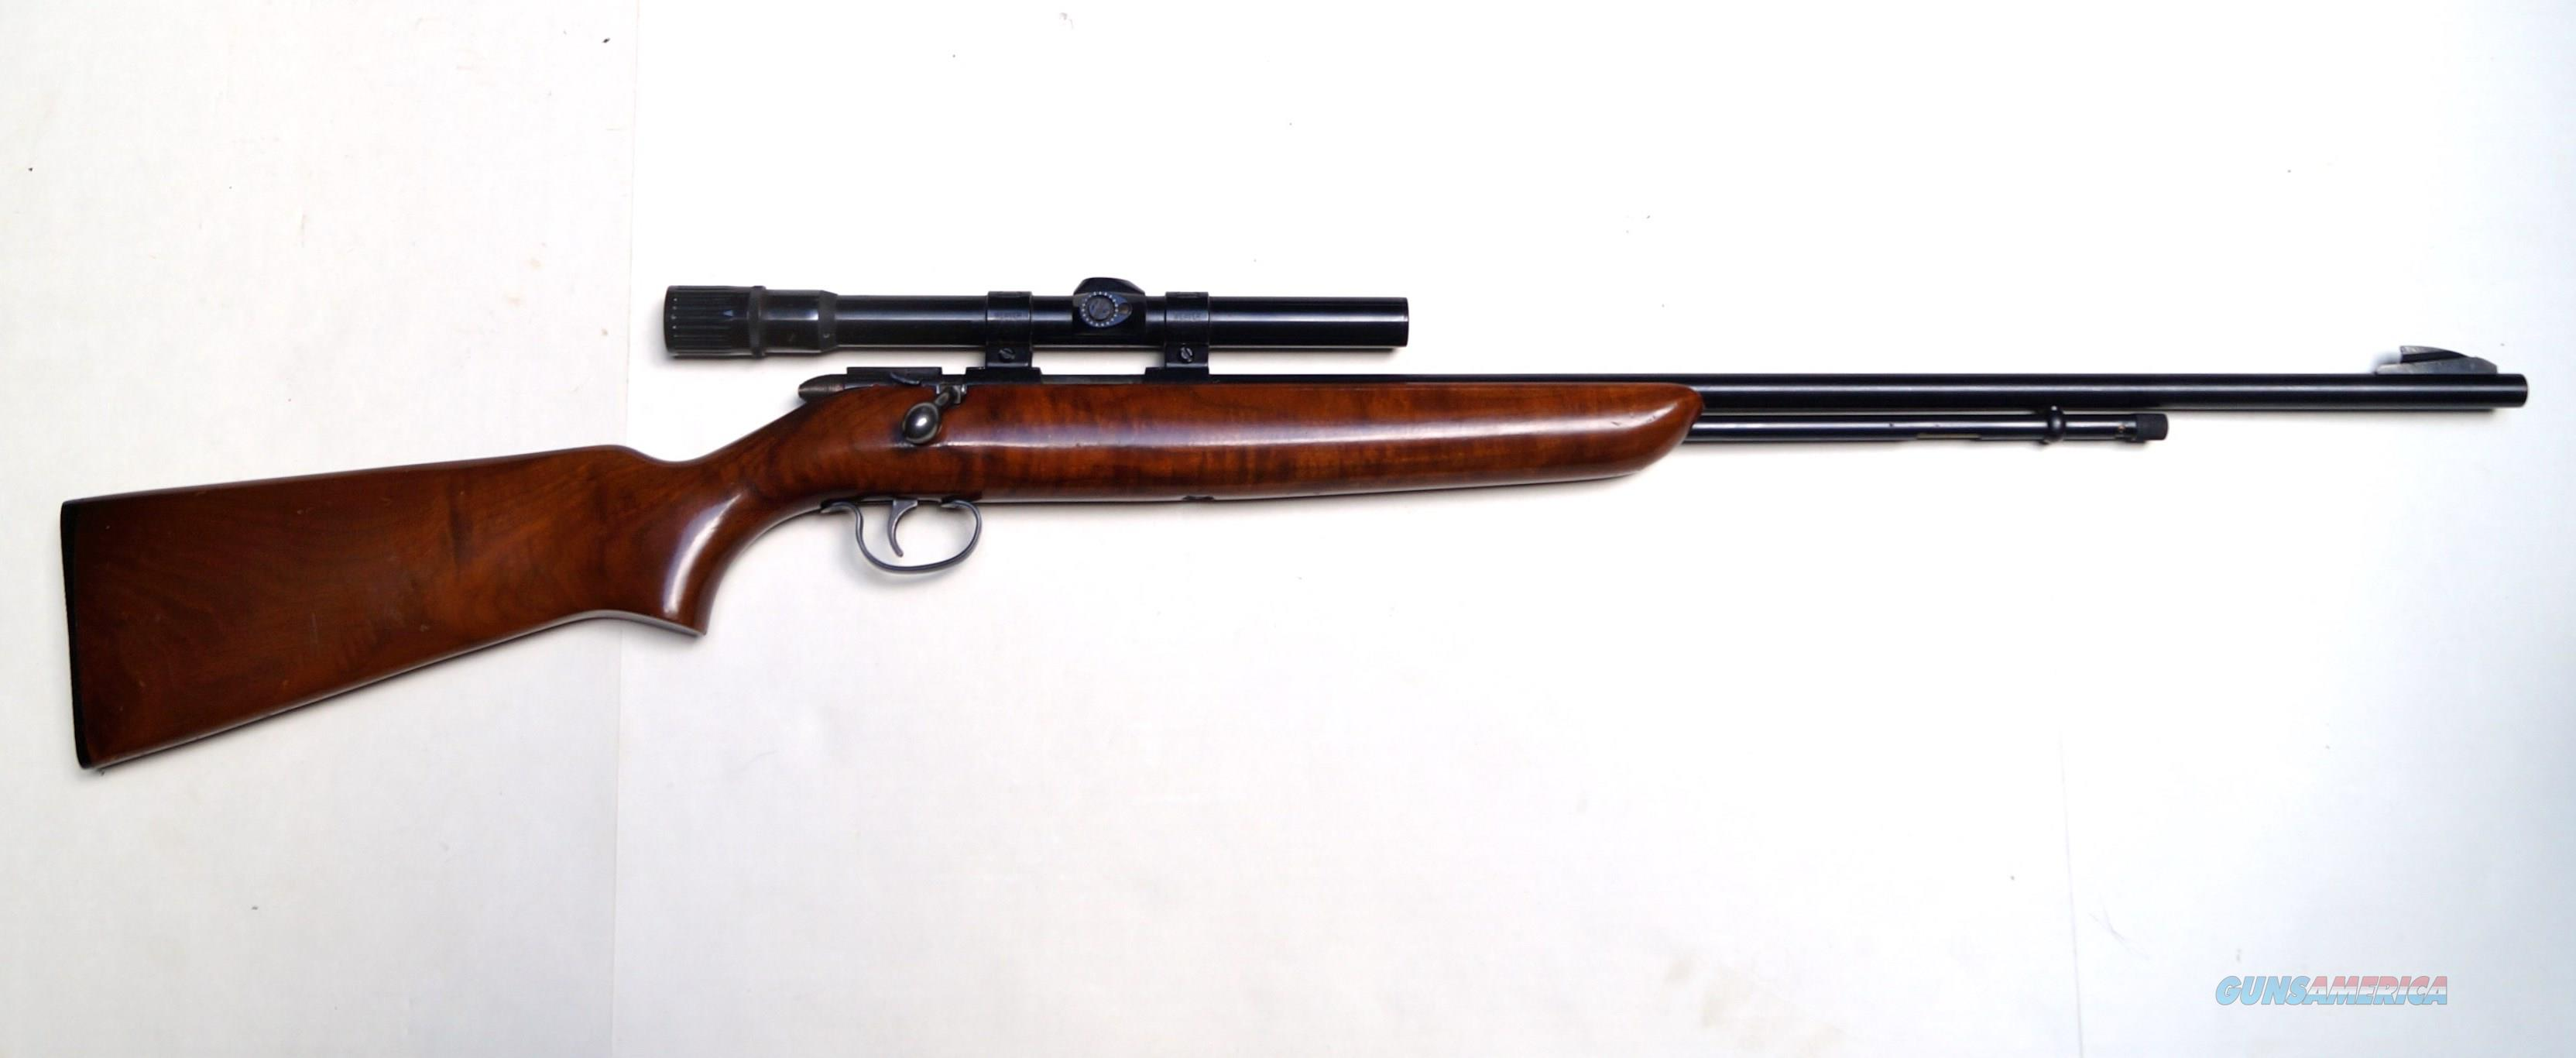 REMINGTON MODEL 512X WITH A WEAVER SCOPE  Guns > Rifles > Remington Rifles - Modern > Bolt Action Non-Model 700 > Sporting